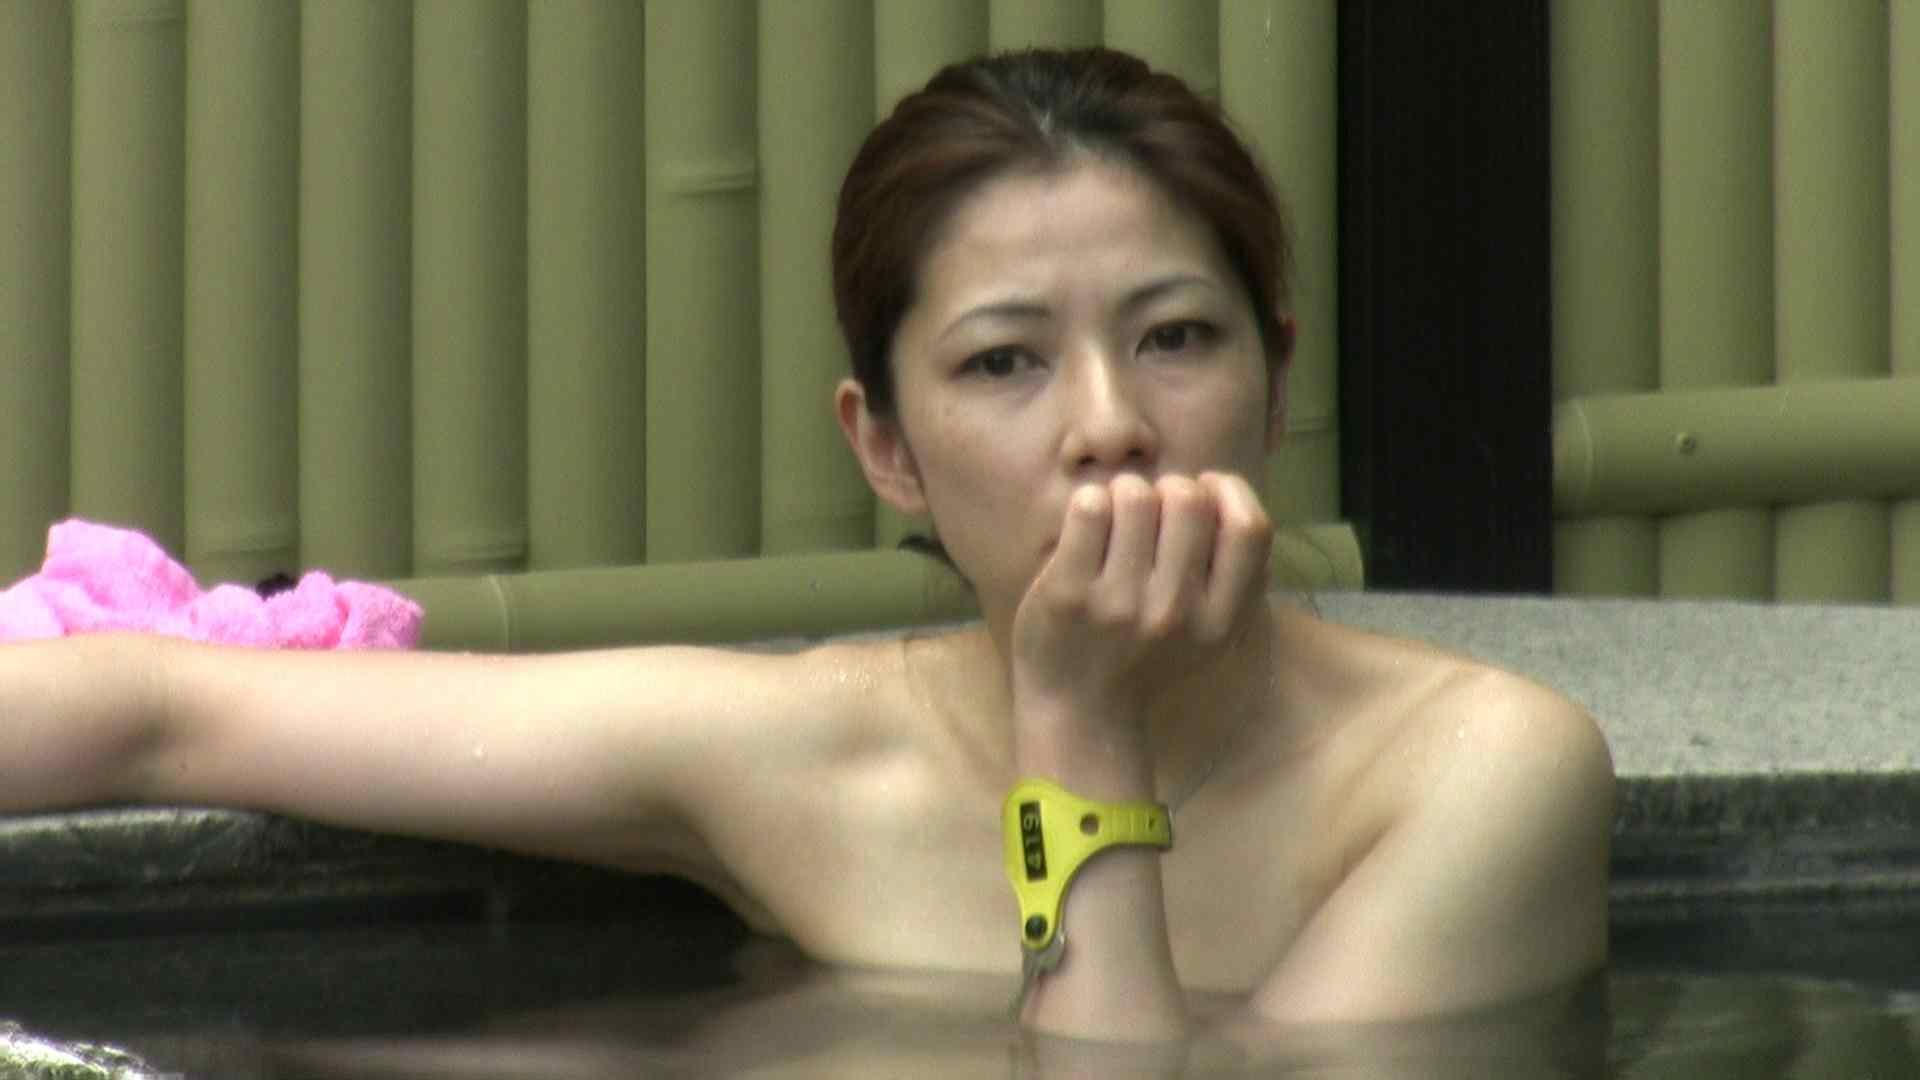 Aquaな露天風呂Vol.660 盗撮 すけべAV動画紹介 66枚 32